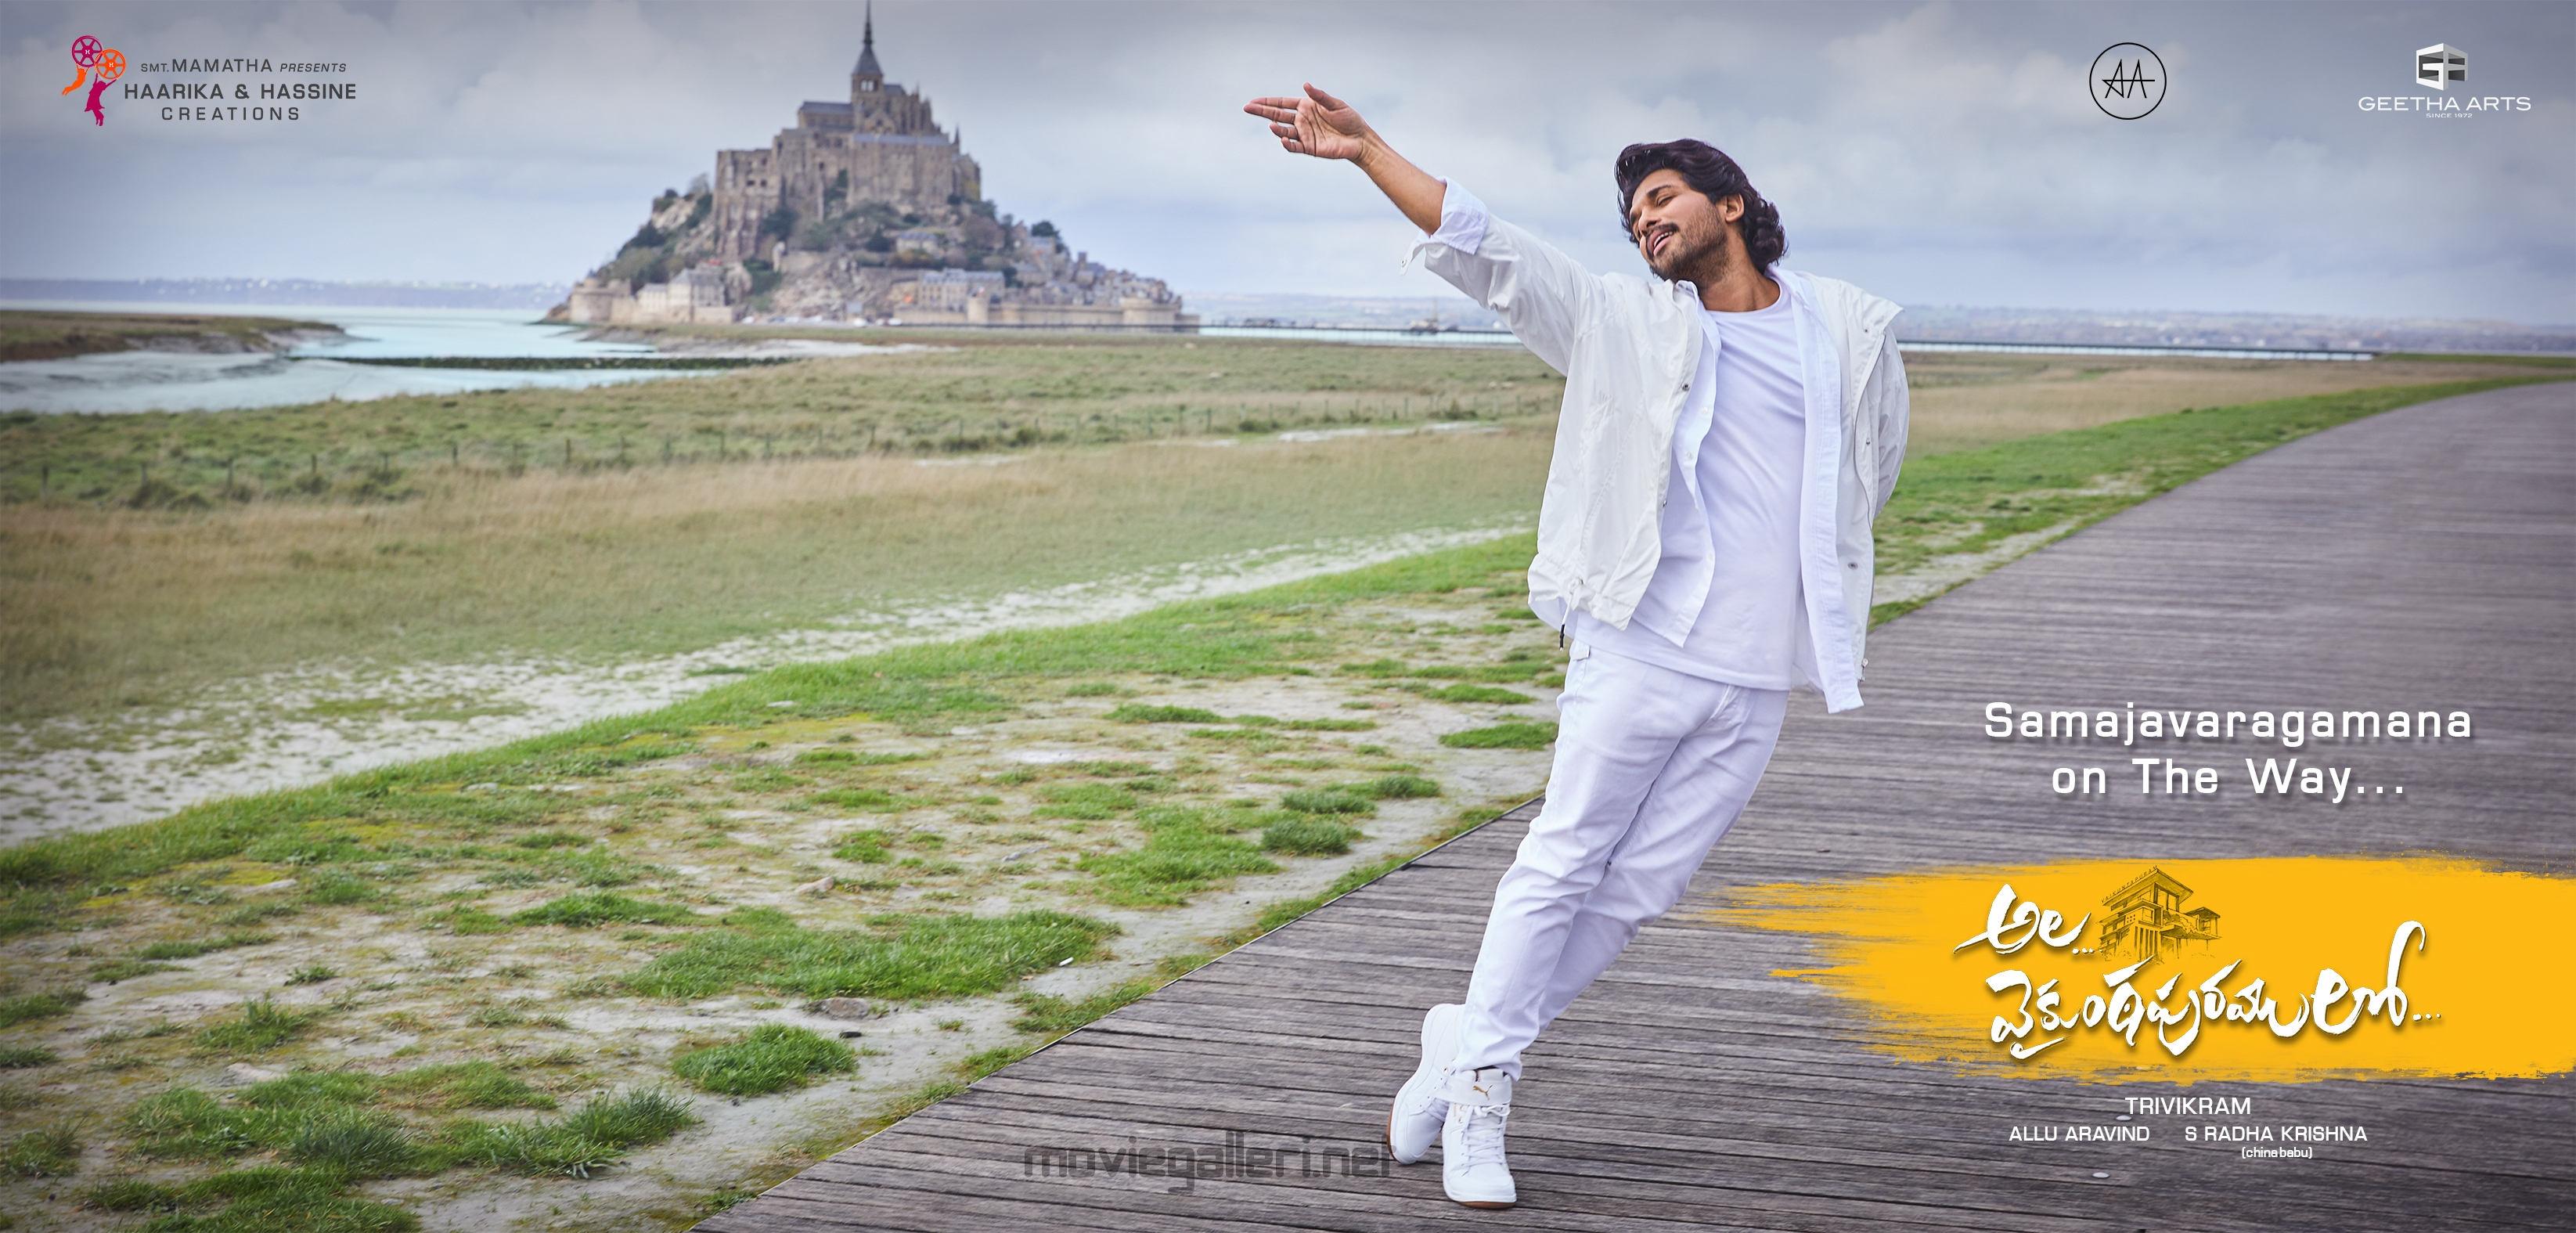 Allu Arjun Ala Vaikunthapurramlo Samajavaragamana song shot in Paris